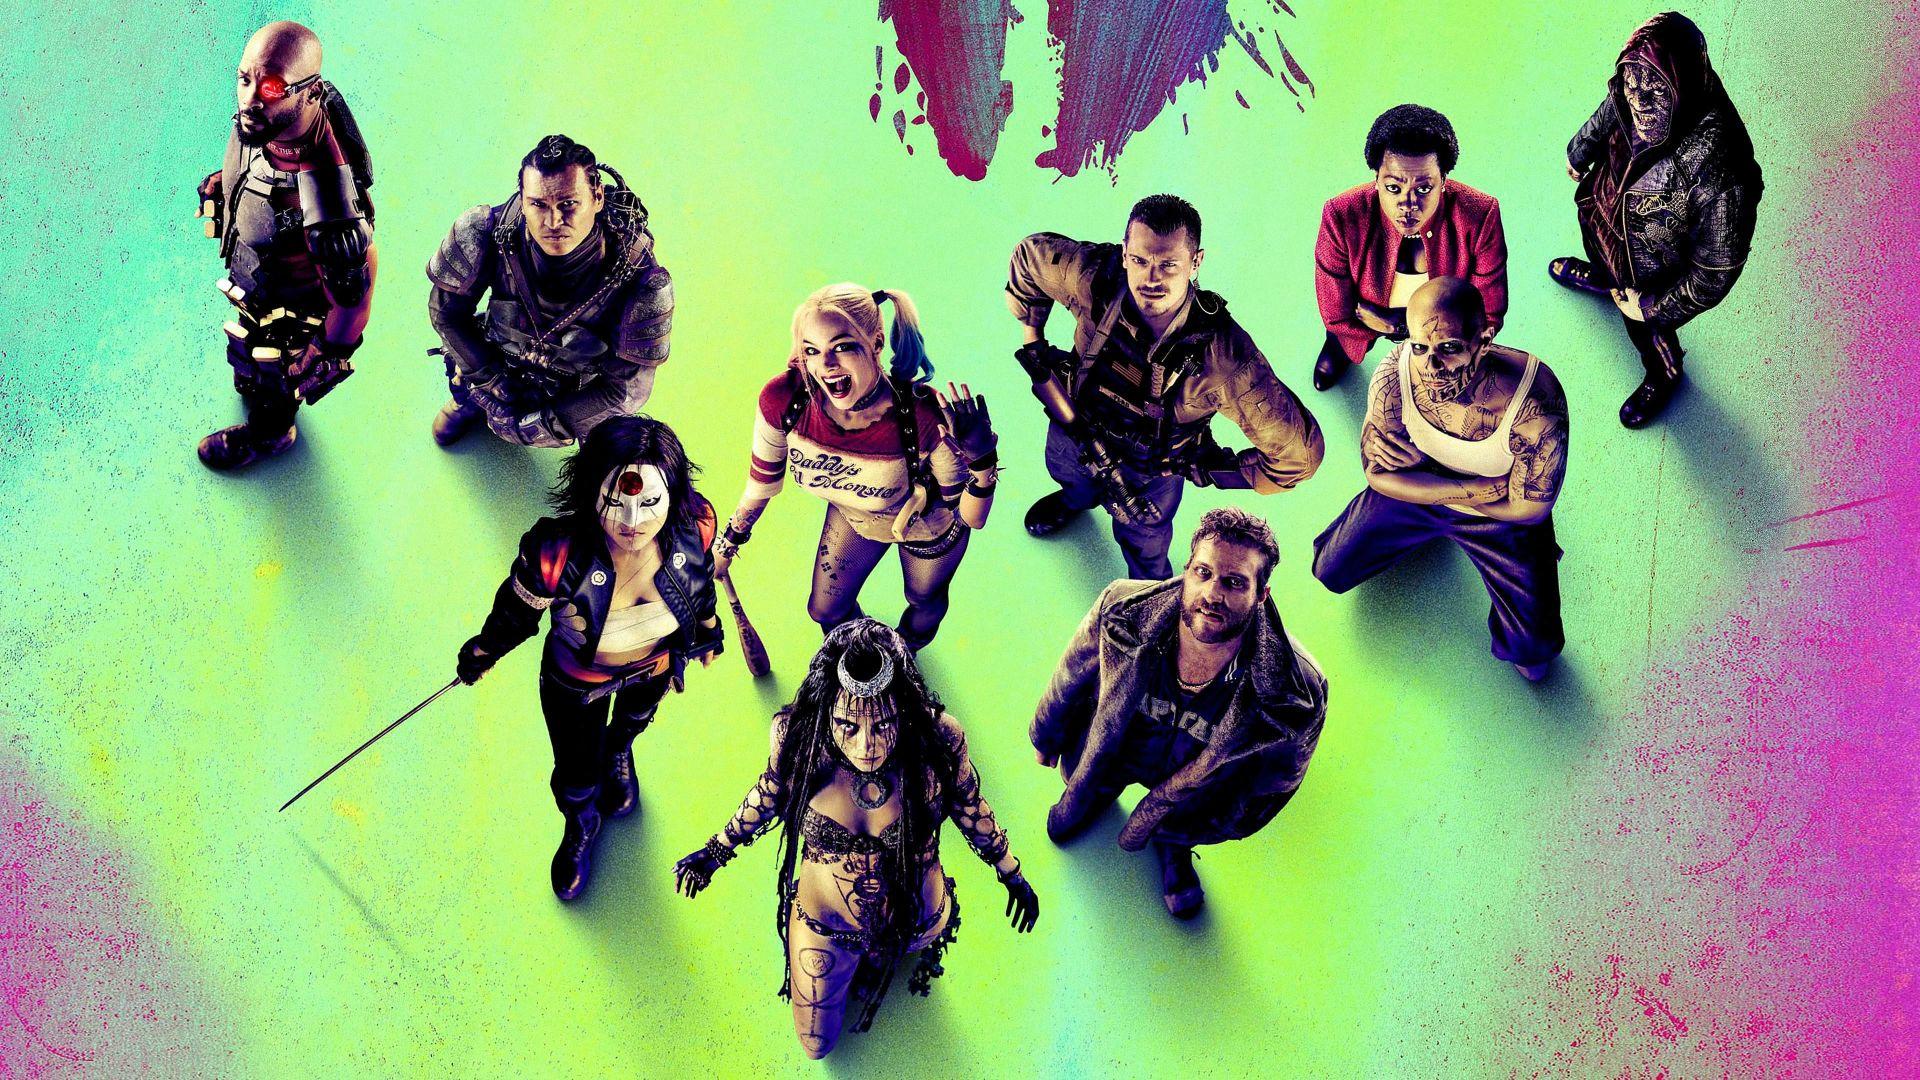 Suicide Squad, Computer Wallpaper